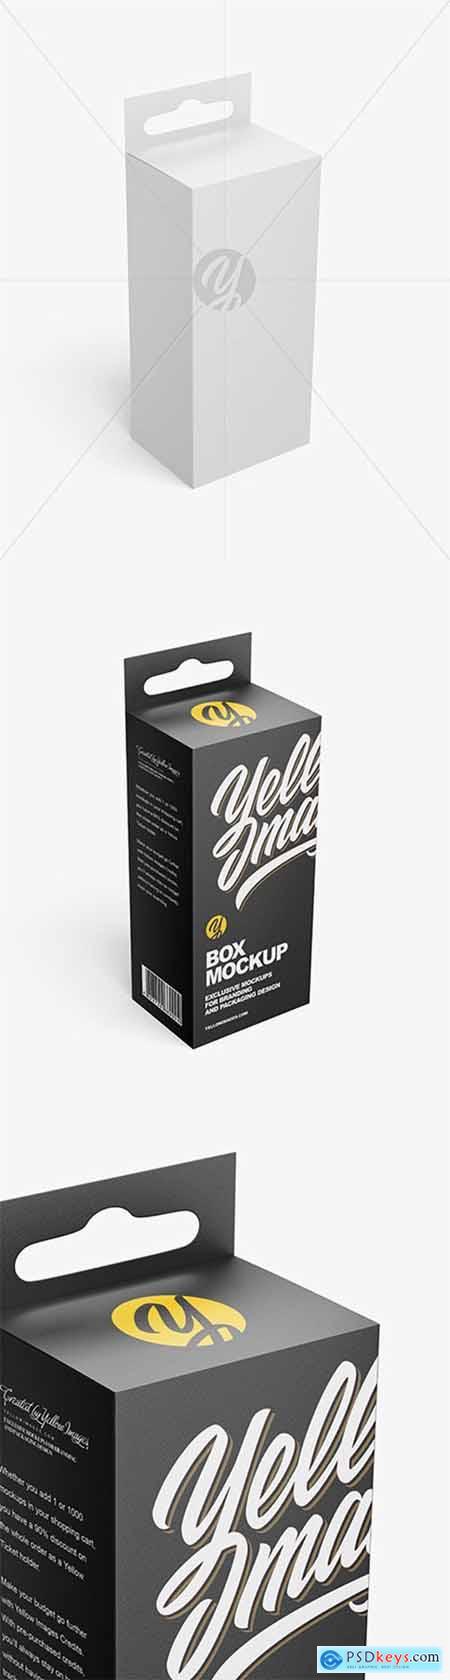 Paper Box Mockup 55472